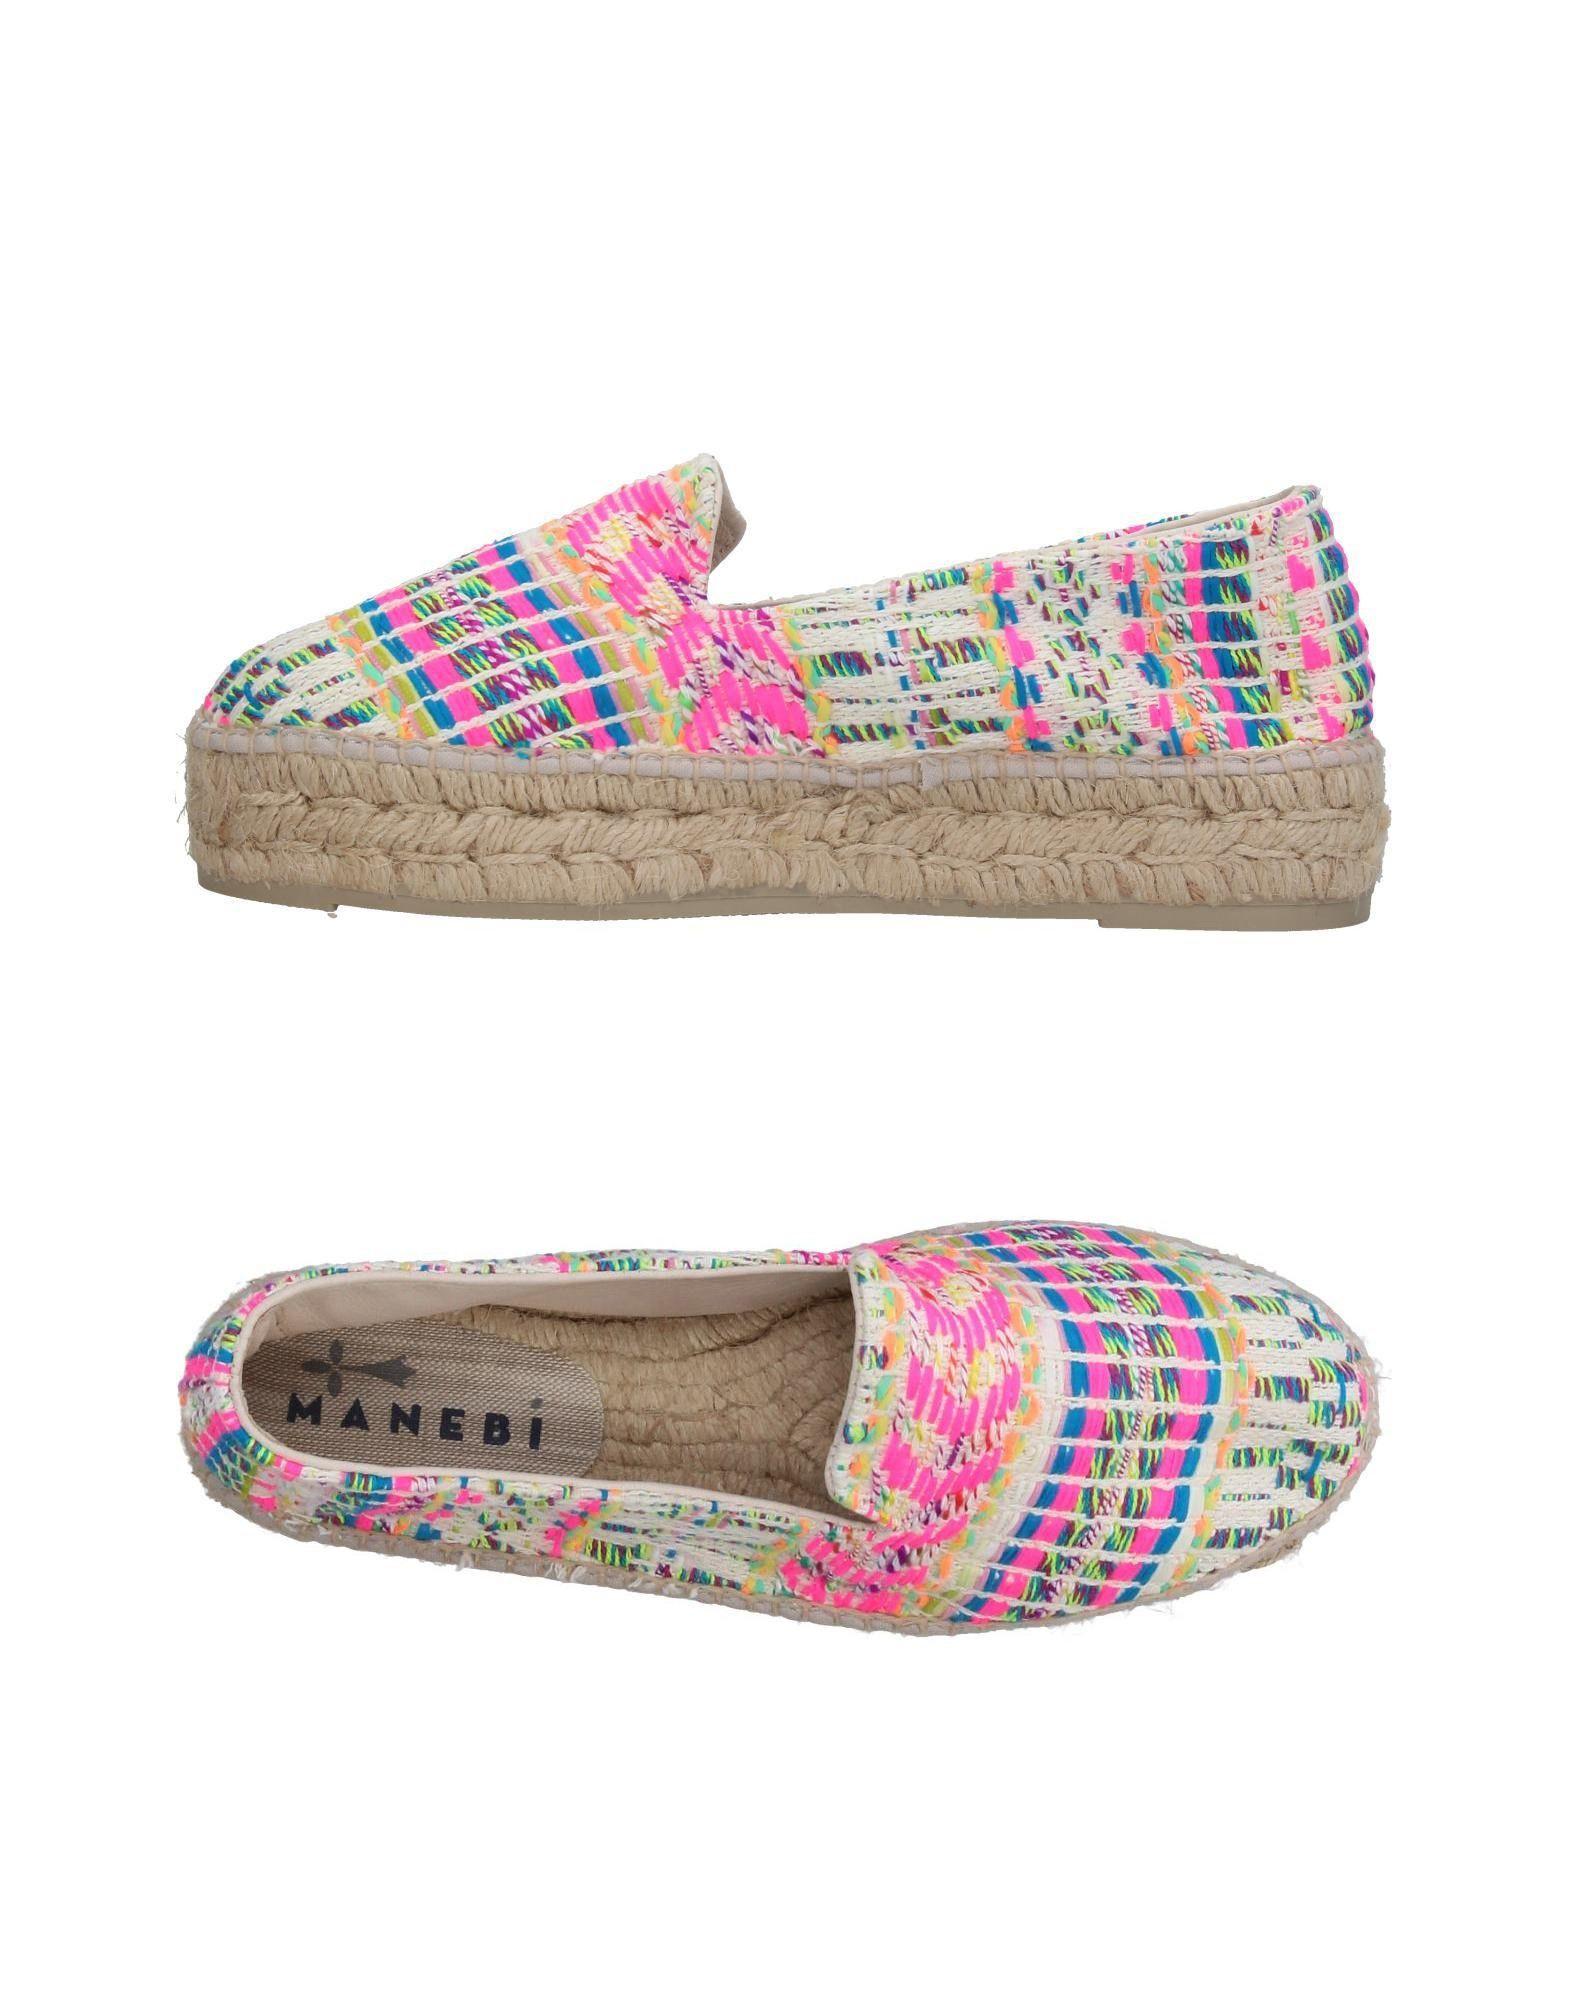 Manebí Espadrilles Damen  11386488KE Gute Qualität beliebte Schuhe